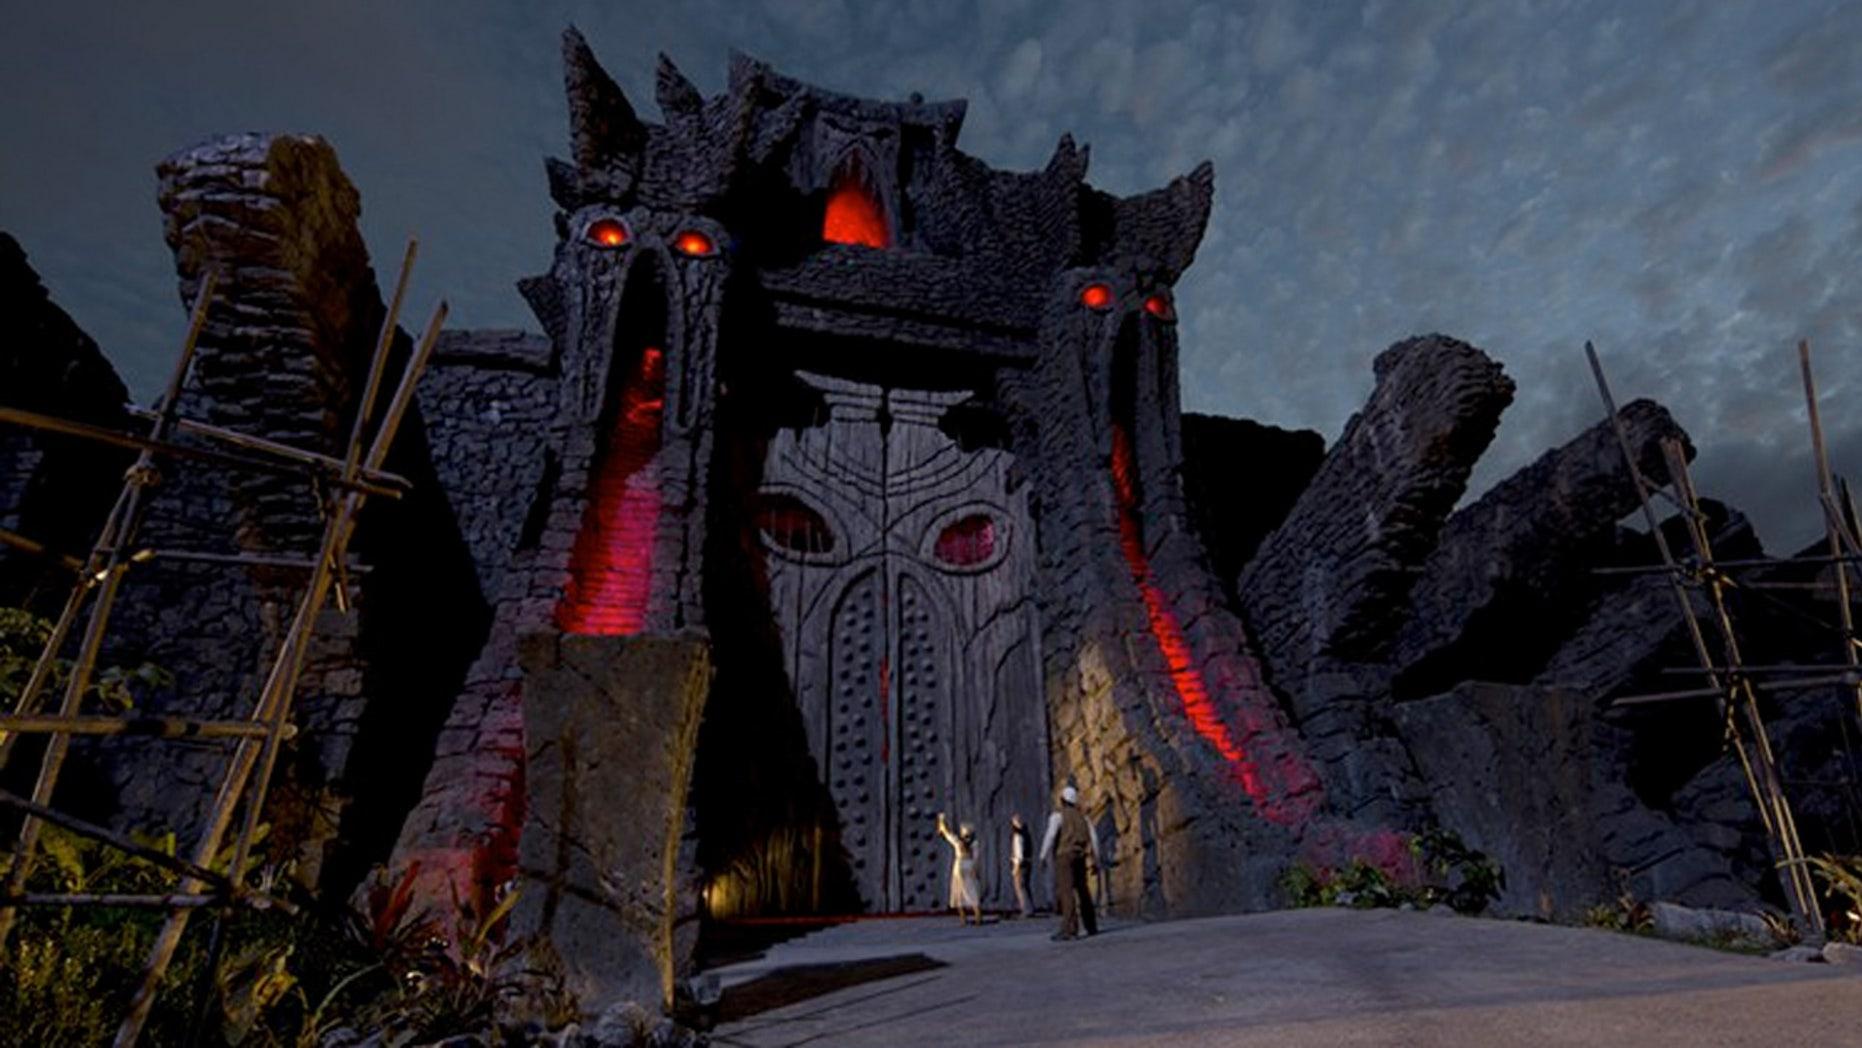 The 72-foot temple doors on Skull Island.